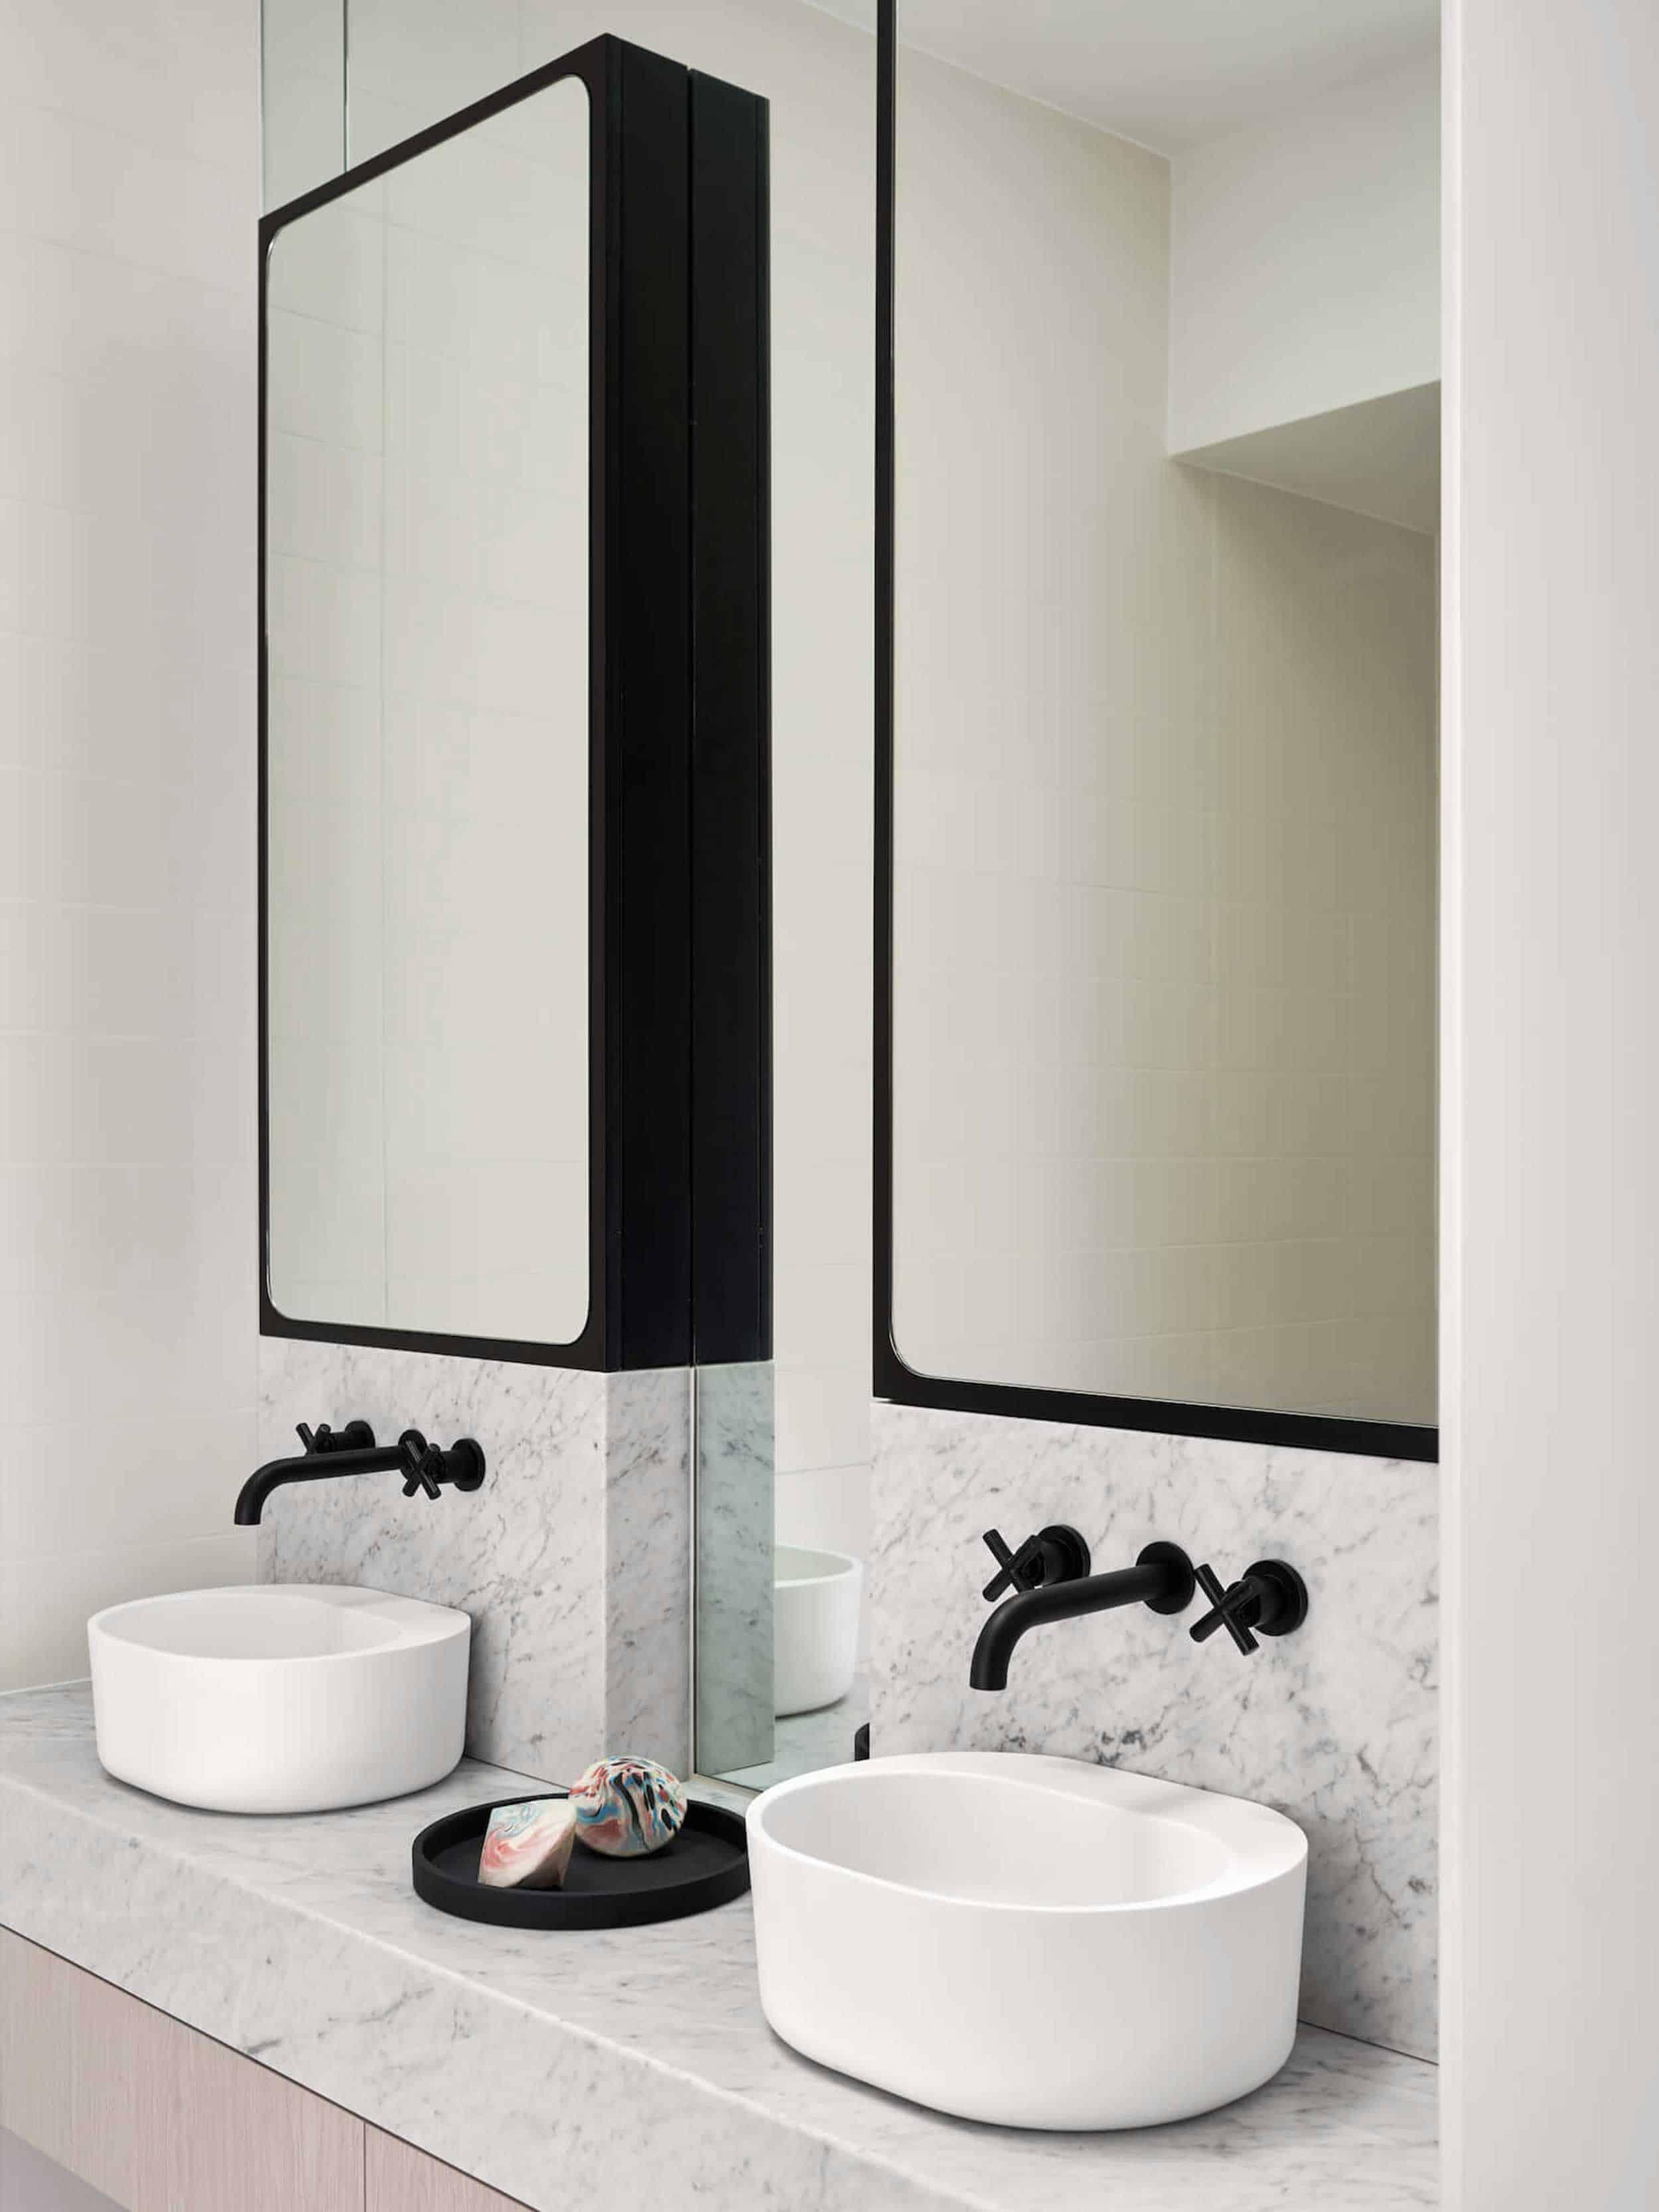 Why Designers Hate Most Medicine Cabinets Some Genius Alternative Bathroom Storage Solutions Emily Henderson